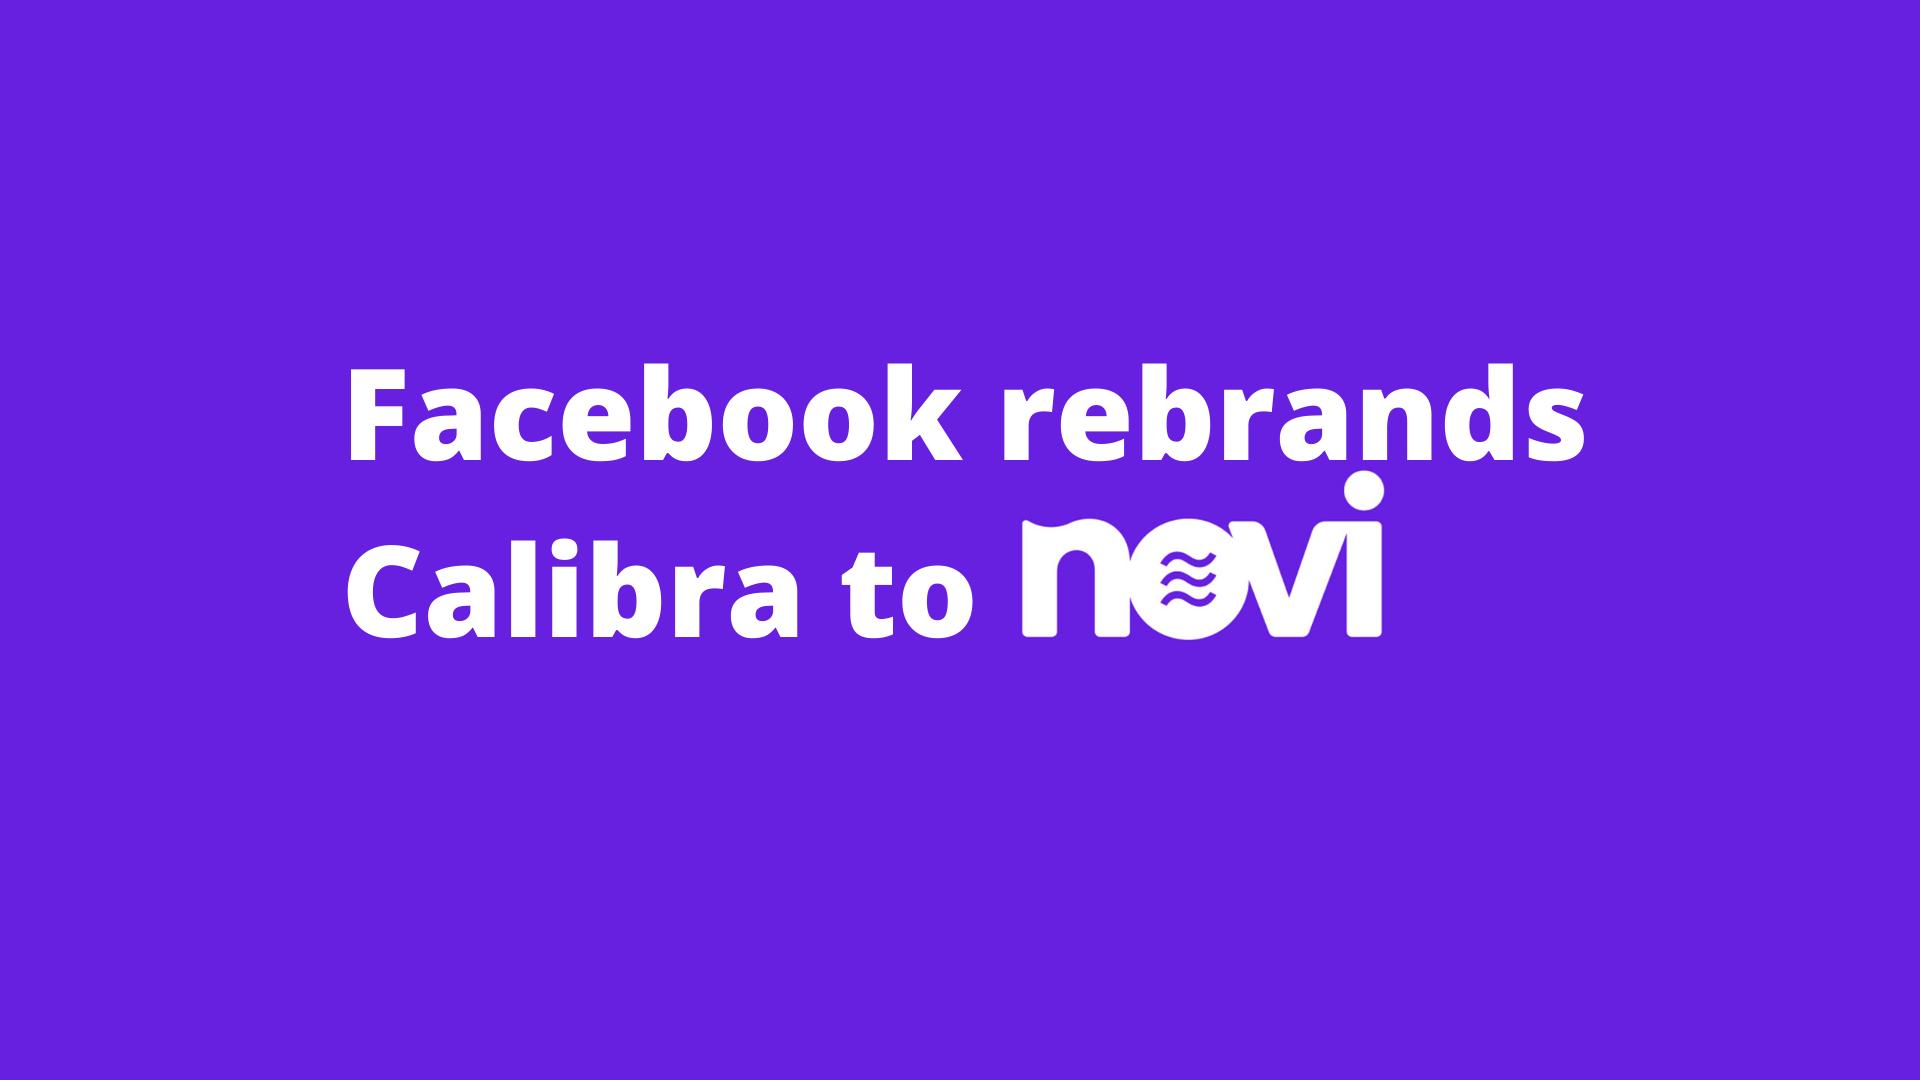 Facebook rebrands Calibra to Novi as the digital wallet for Libra cryptocurrency